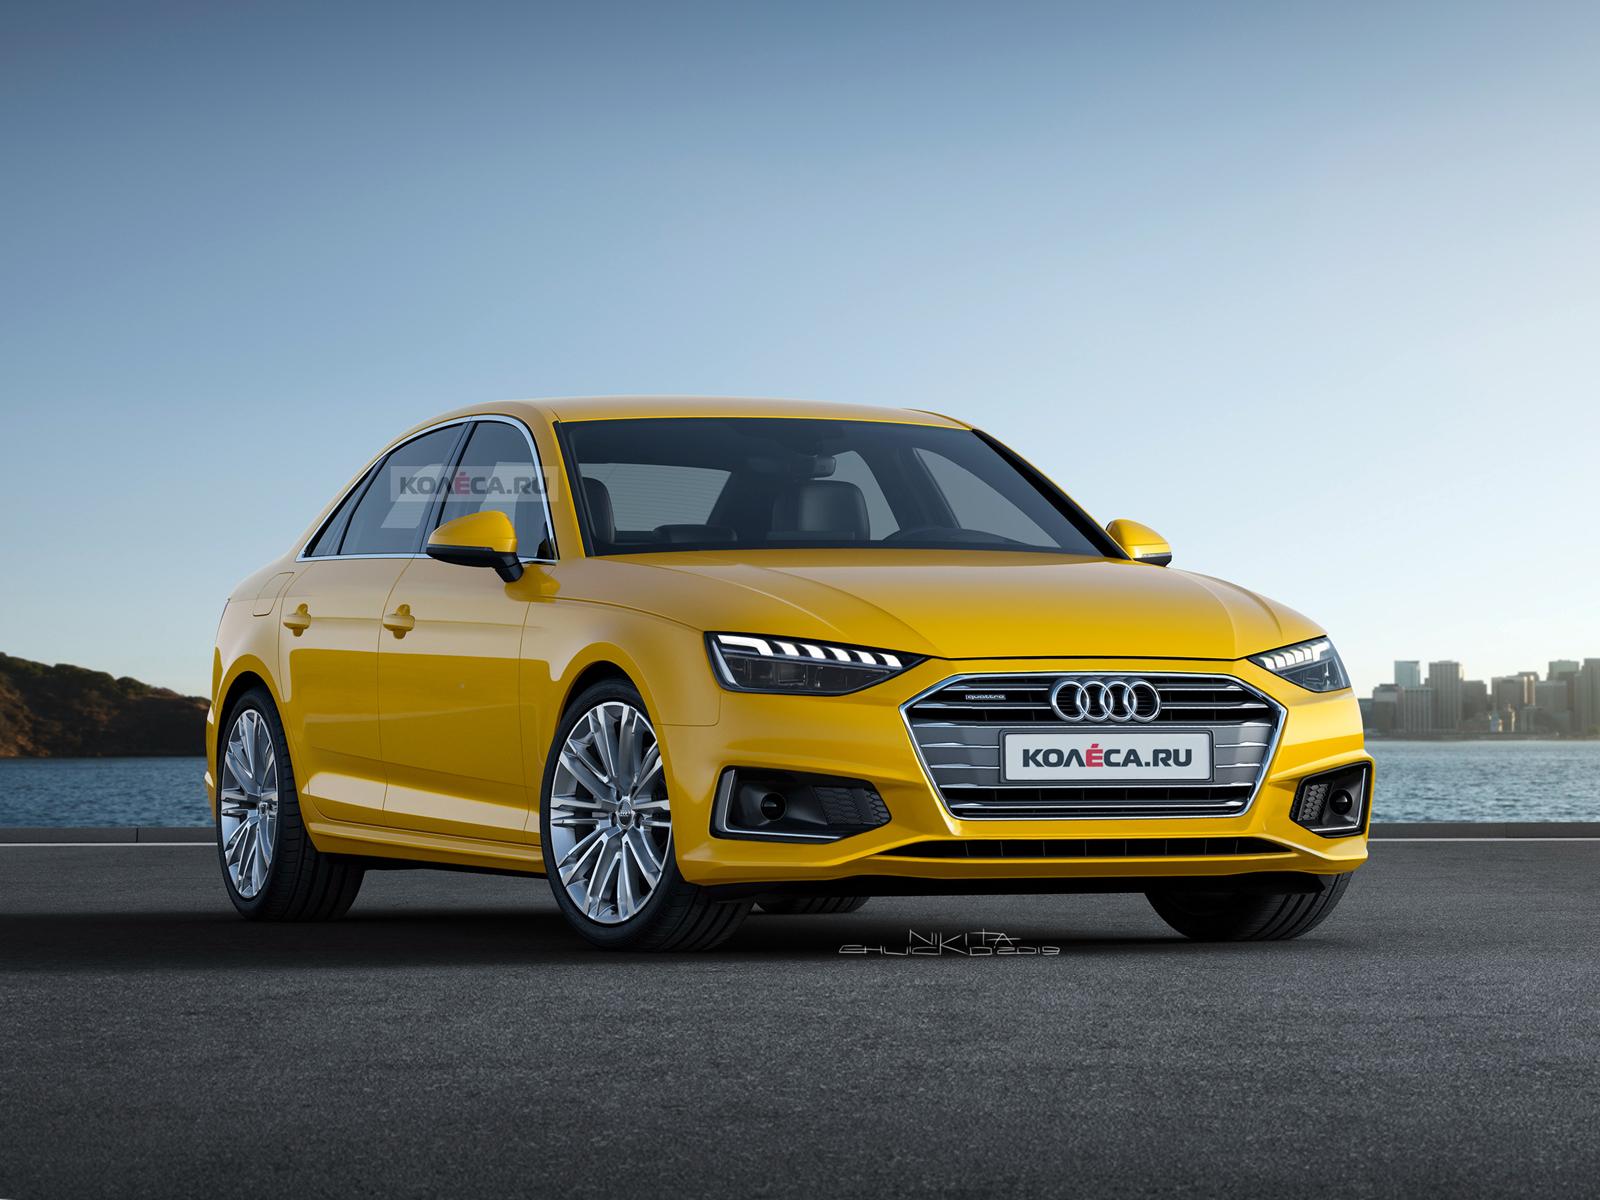 обновлённая Audi A4 B9 колесару